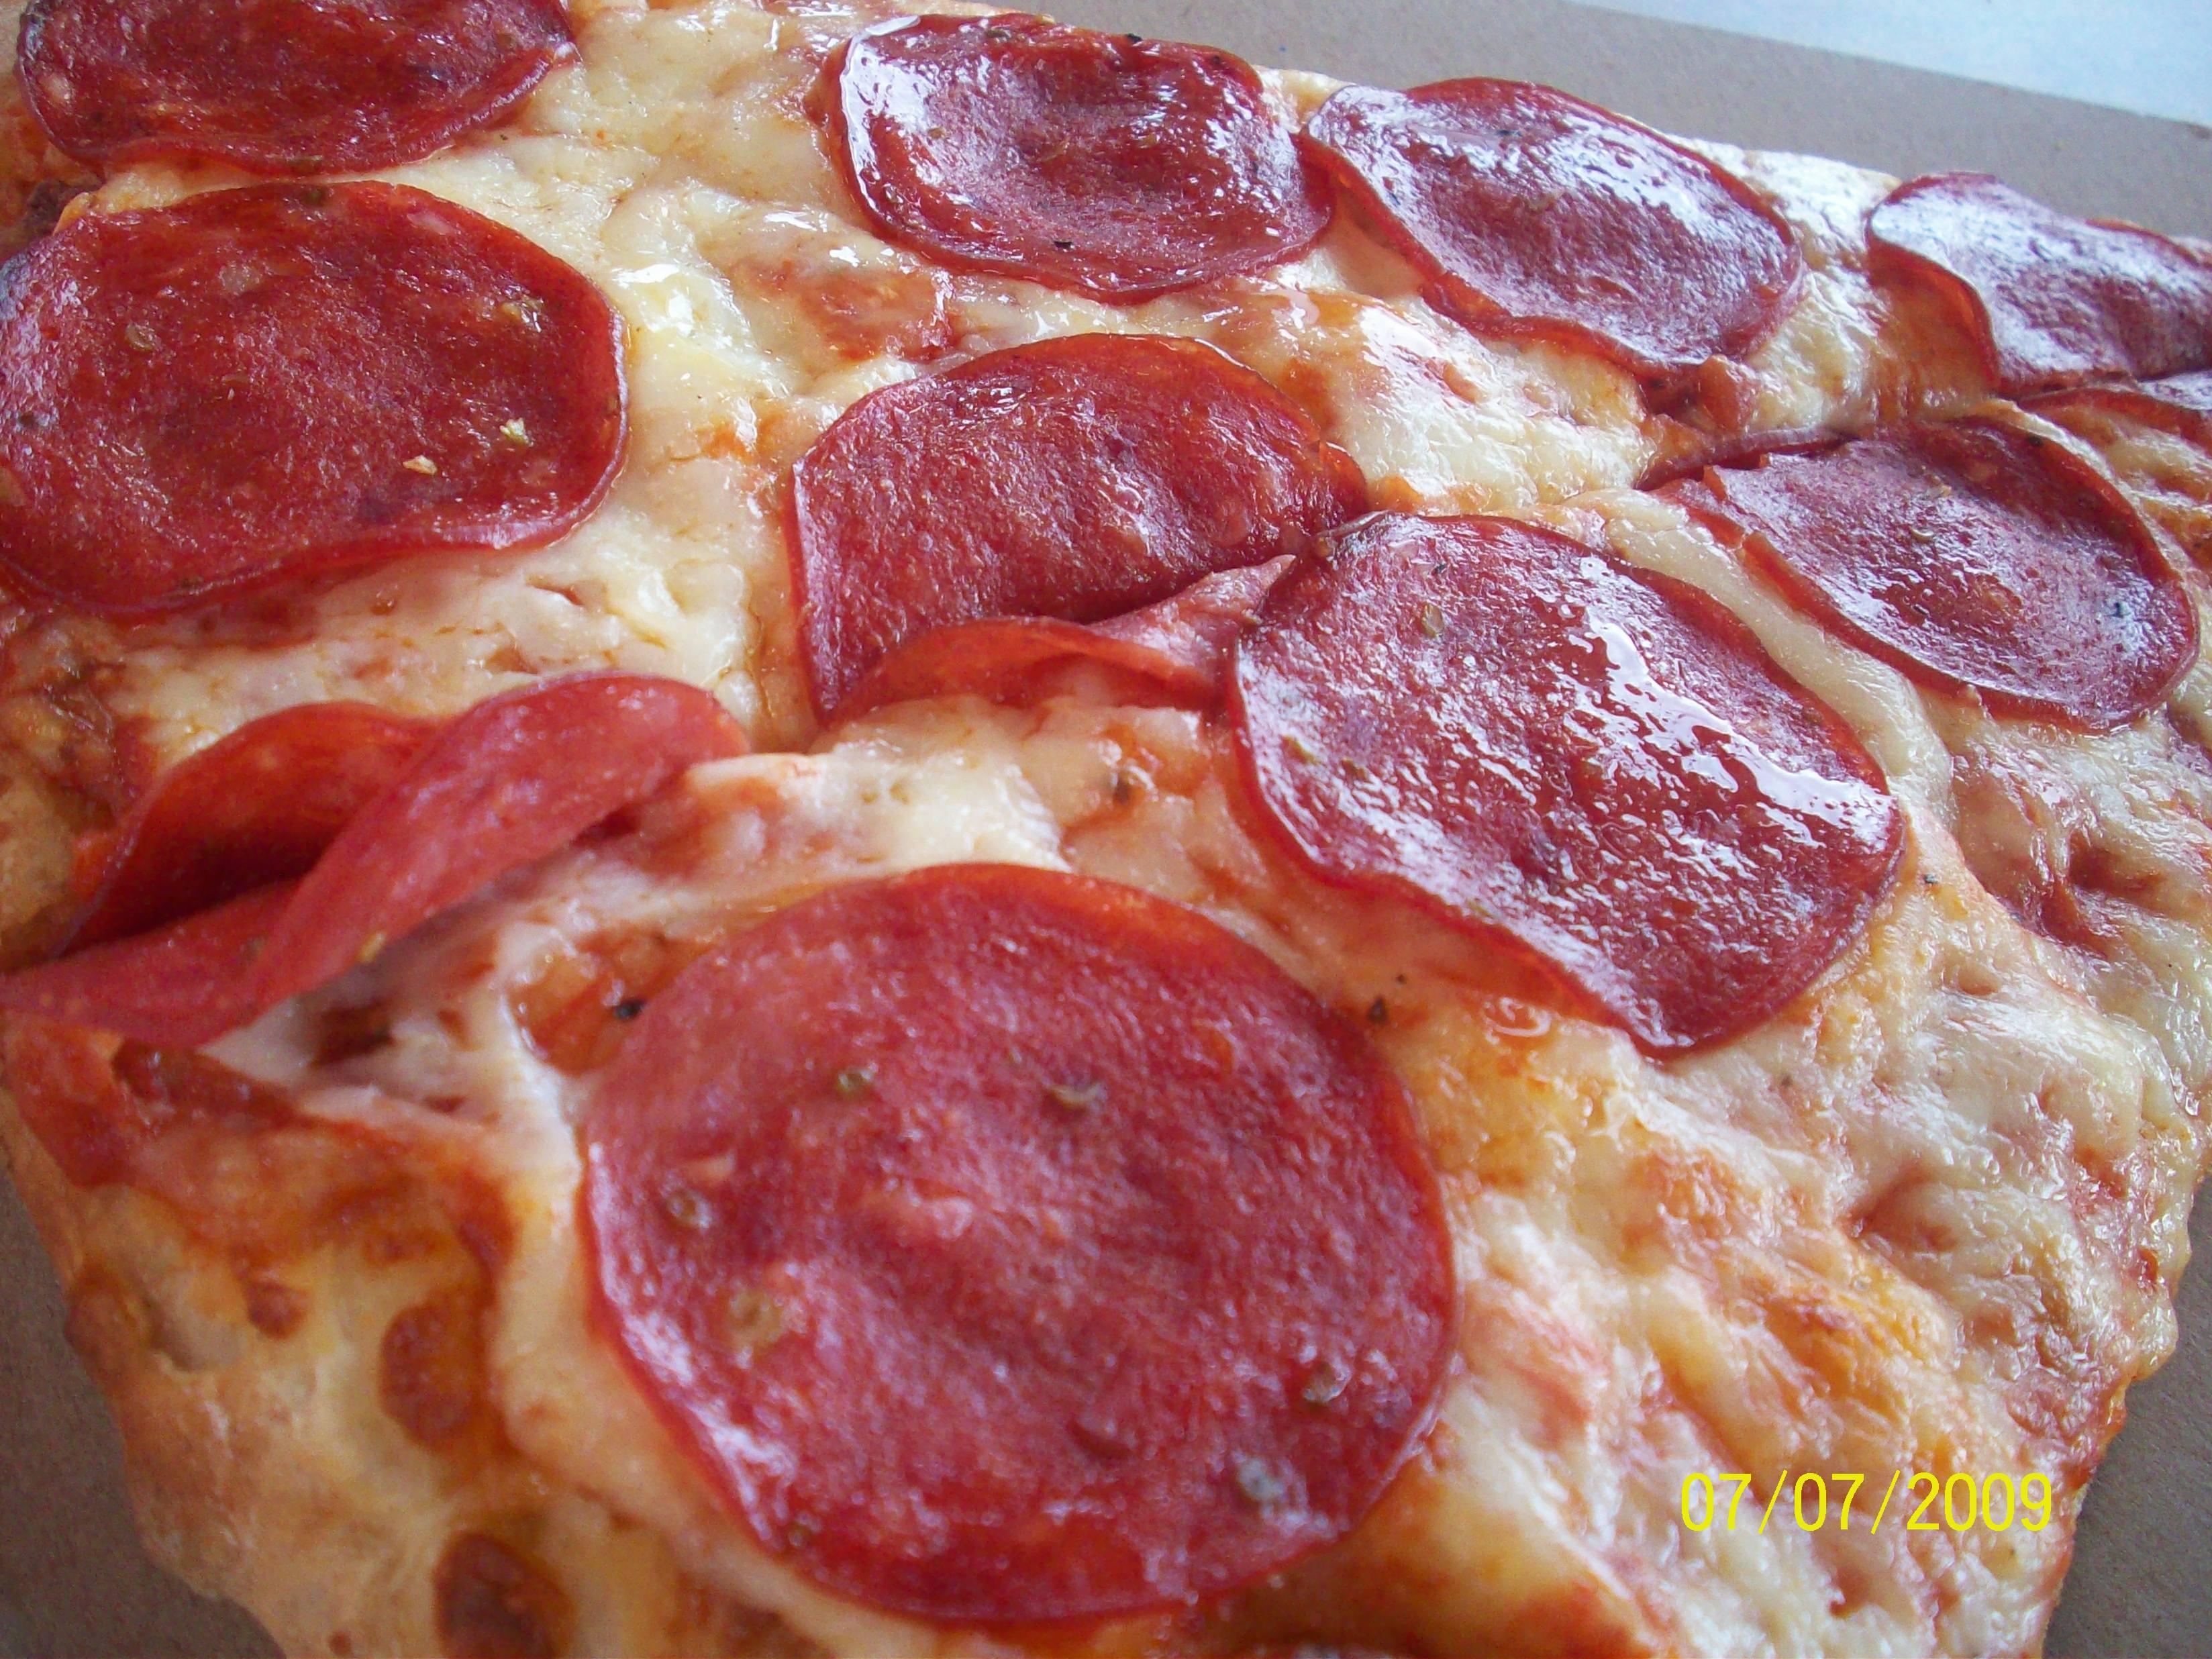 http://foodloader.net/cutie_2009-07-07_Pepperoni_Pizza.jpg